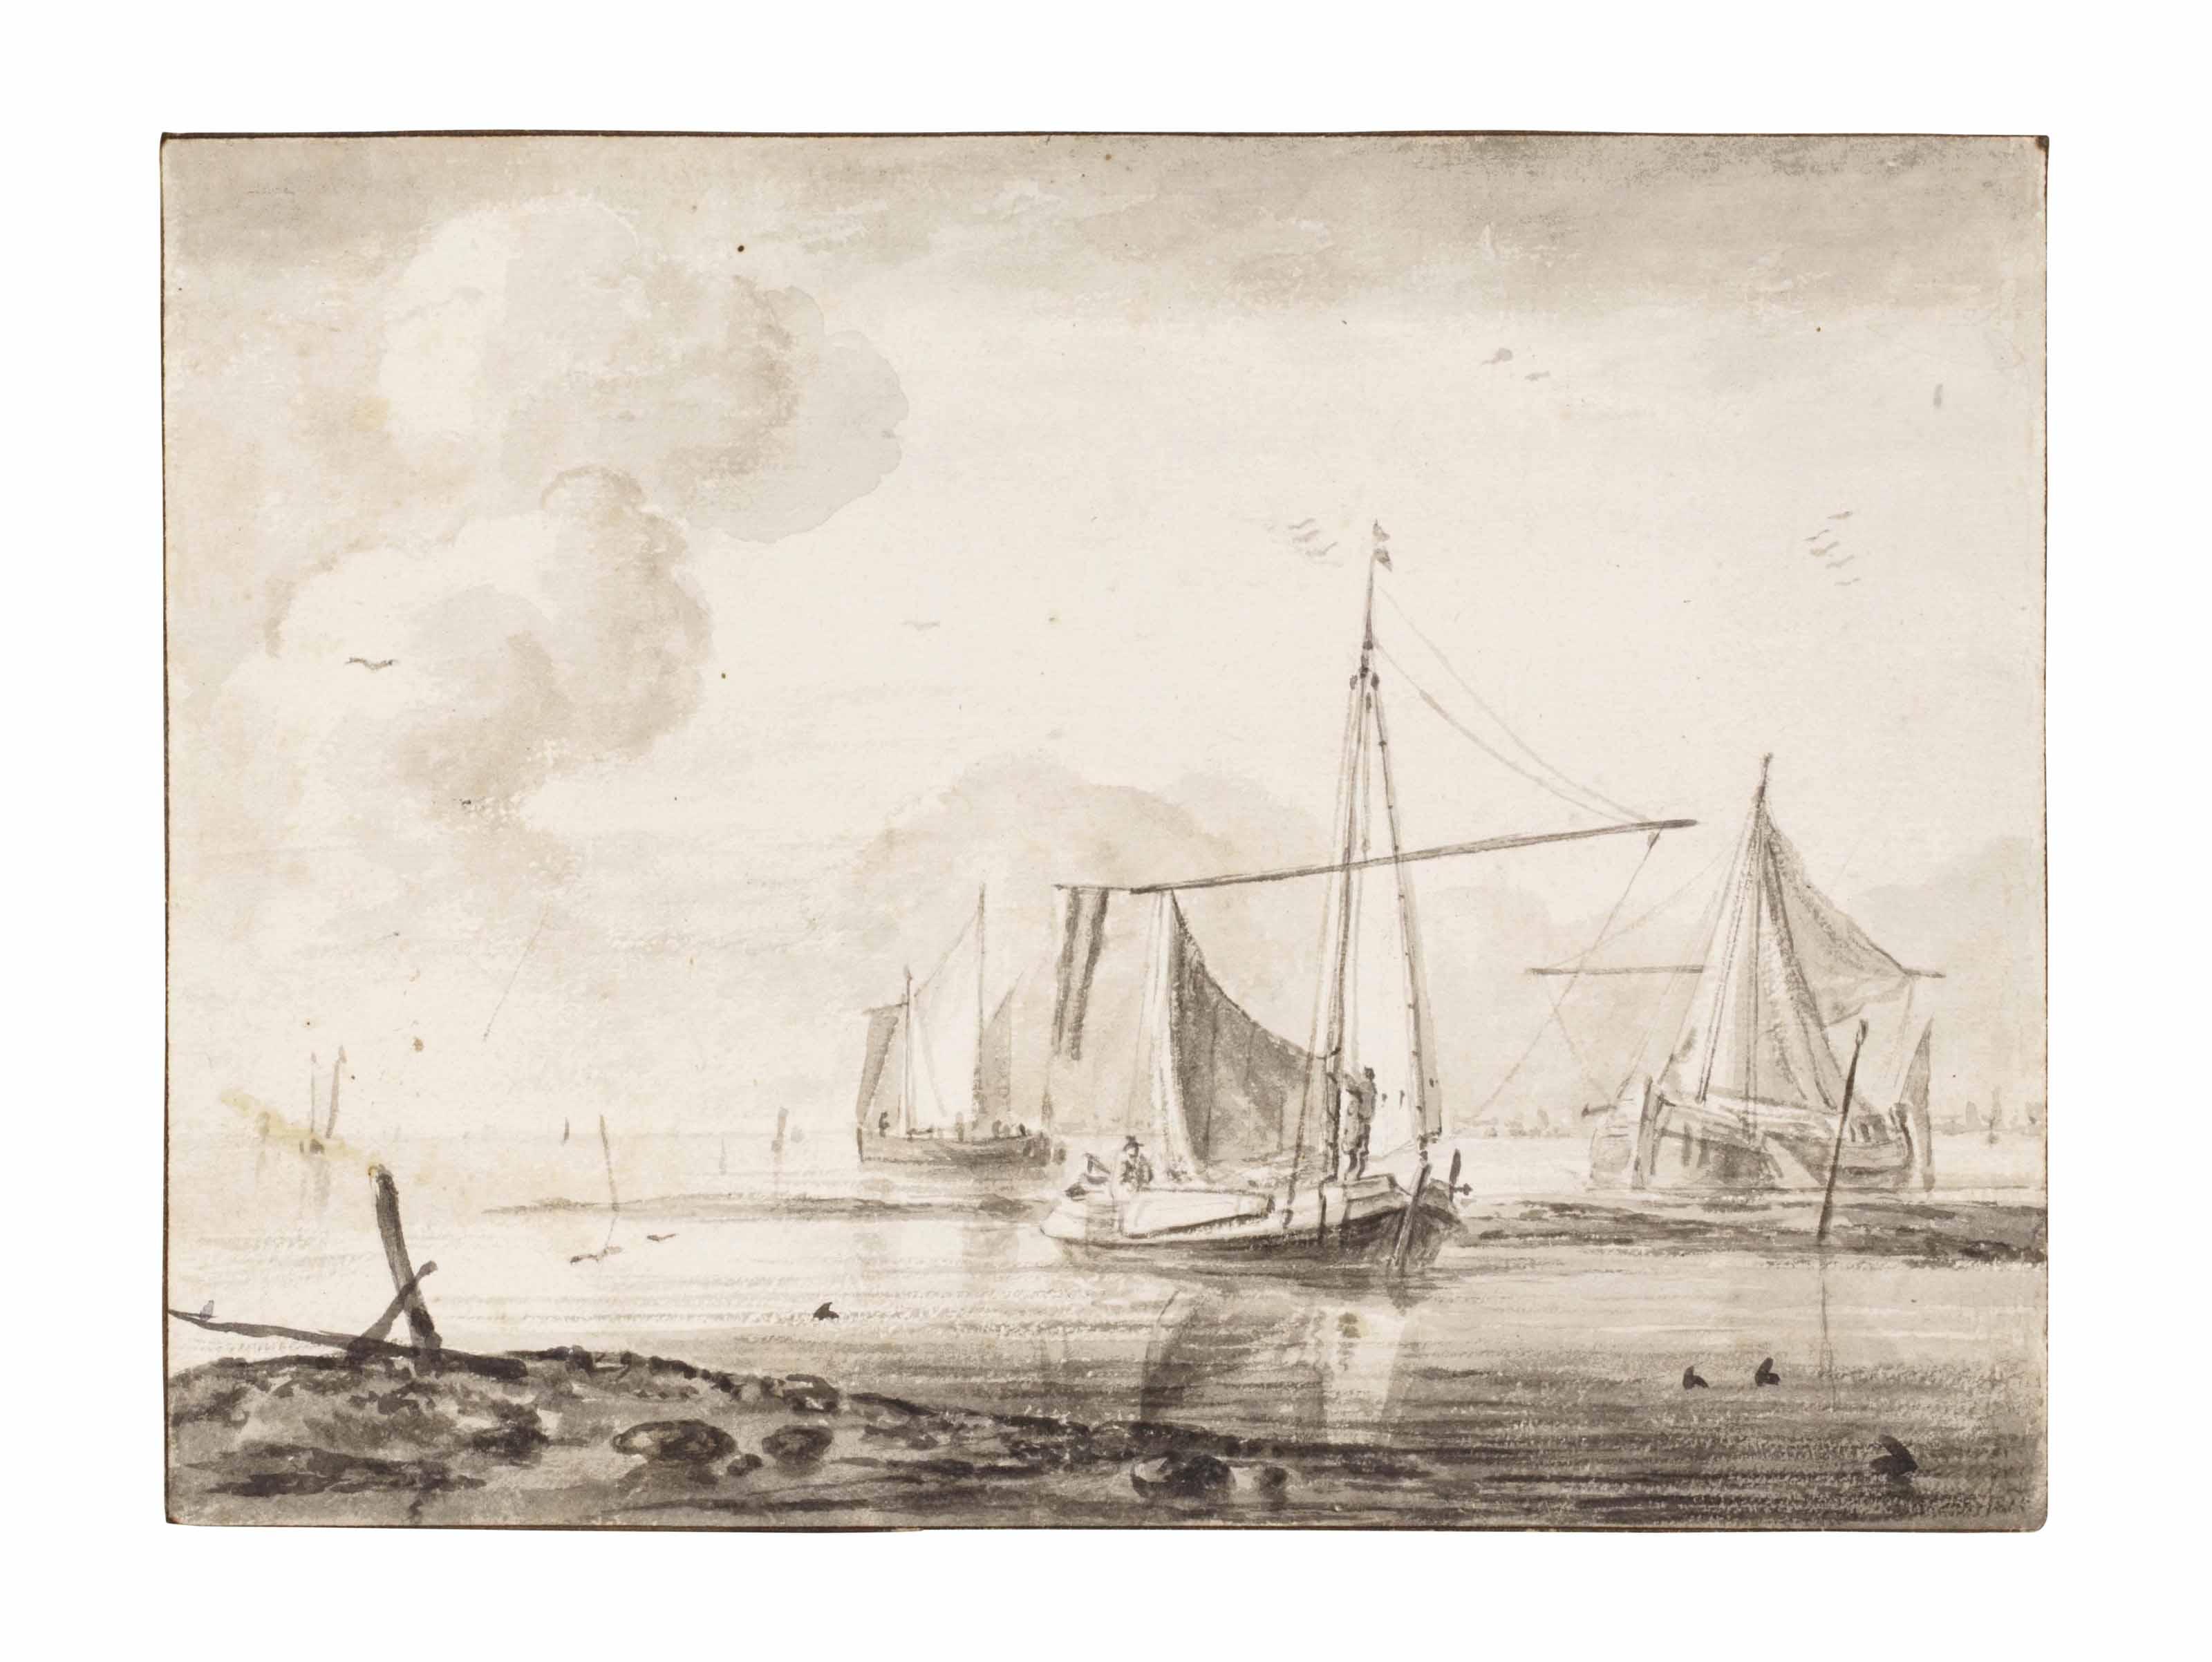 Attributed to Simon de Vlieger (Rotterdam 1600/01-1653 Weesp)